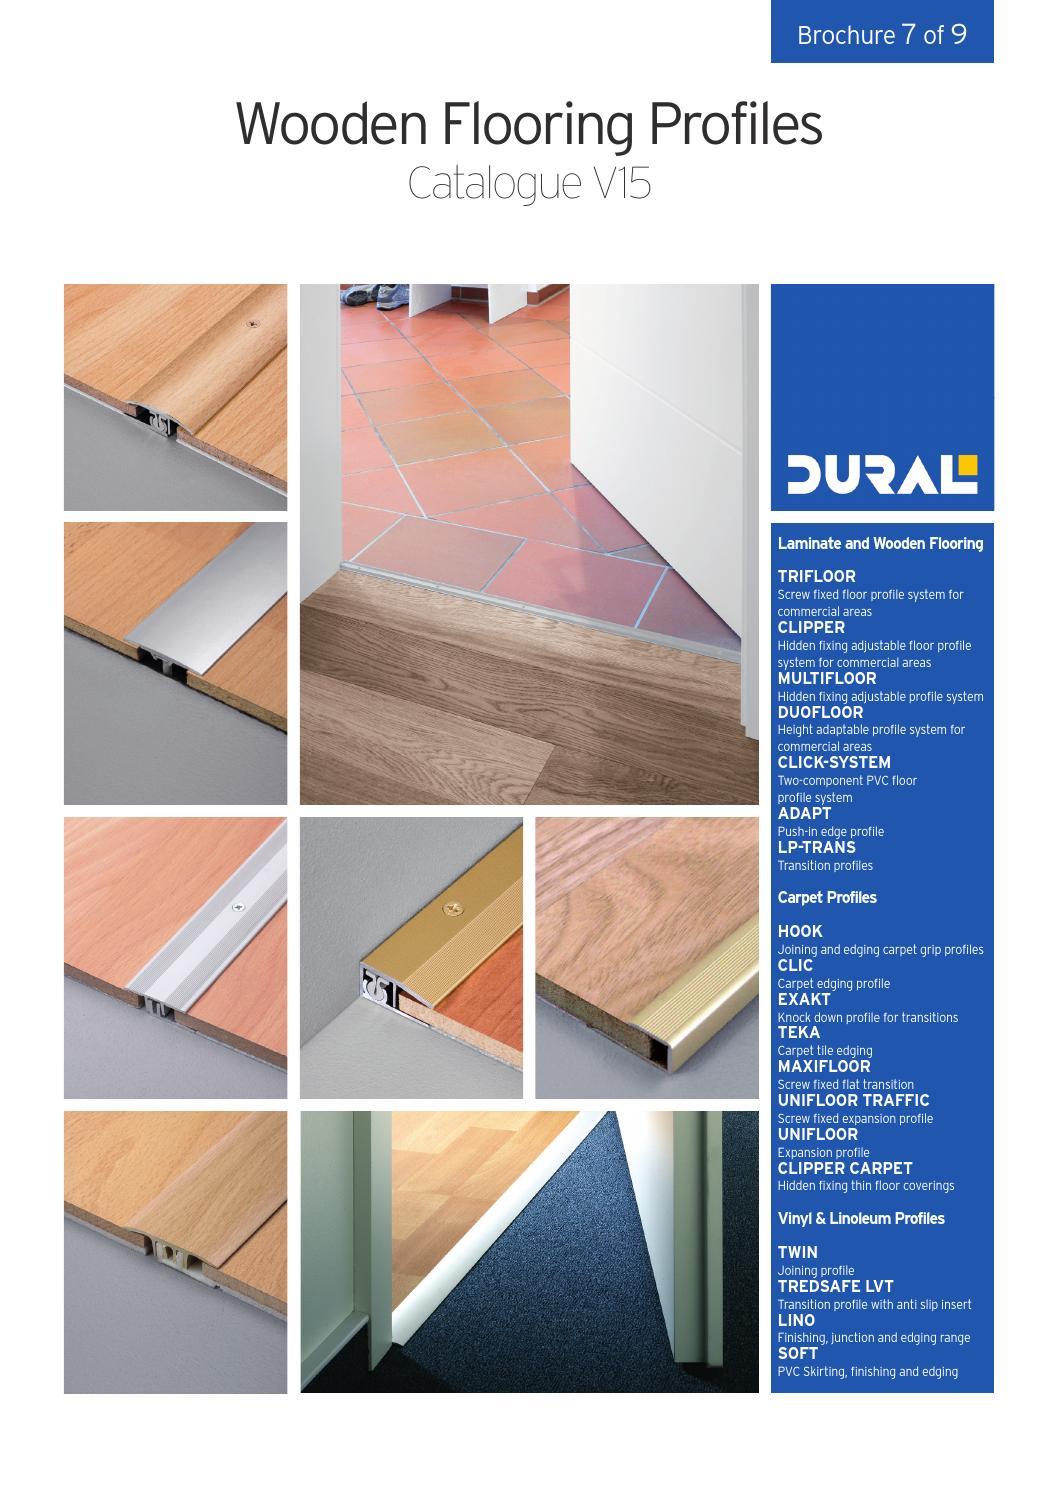 Dural Wooden Flooring Profiles